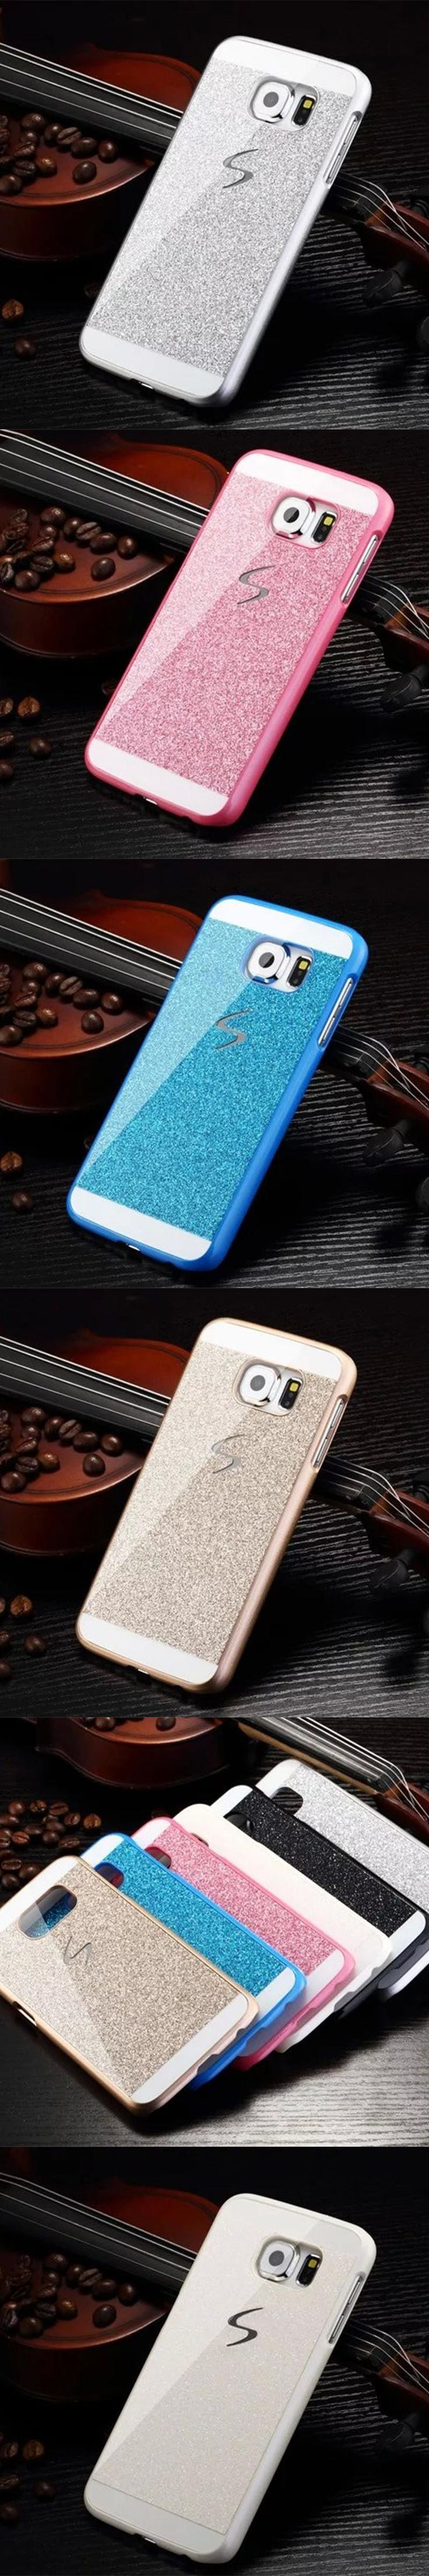 Hard Flash Plastic Cover Diamond Bling Crystal Capa Fundas Case For Samsung Galaxy S8/S8 PLUS/S7/S7 EDGE/S6/S6 EDGE/S6 EDGEPLUS